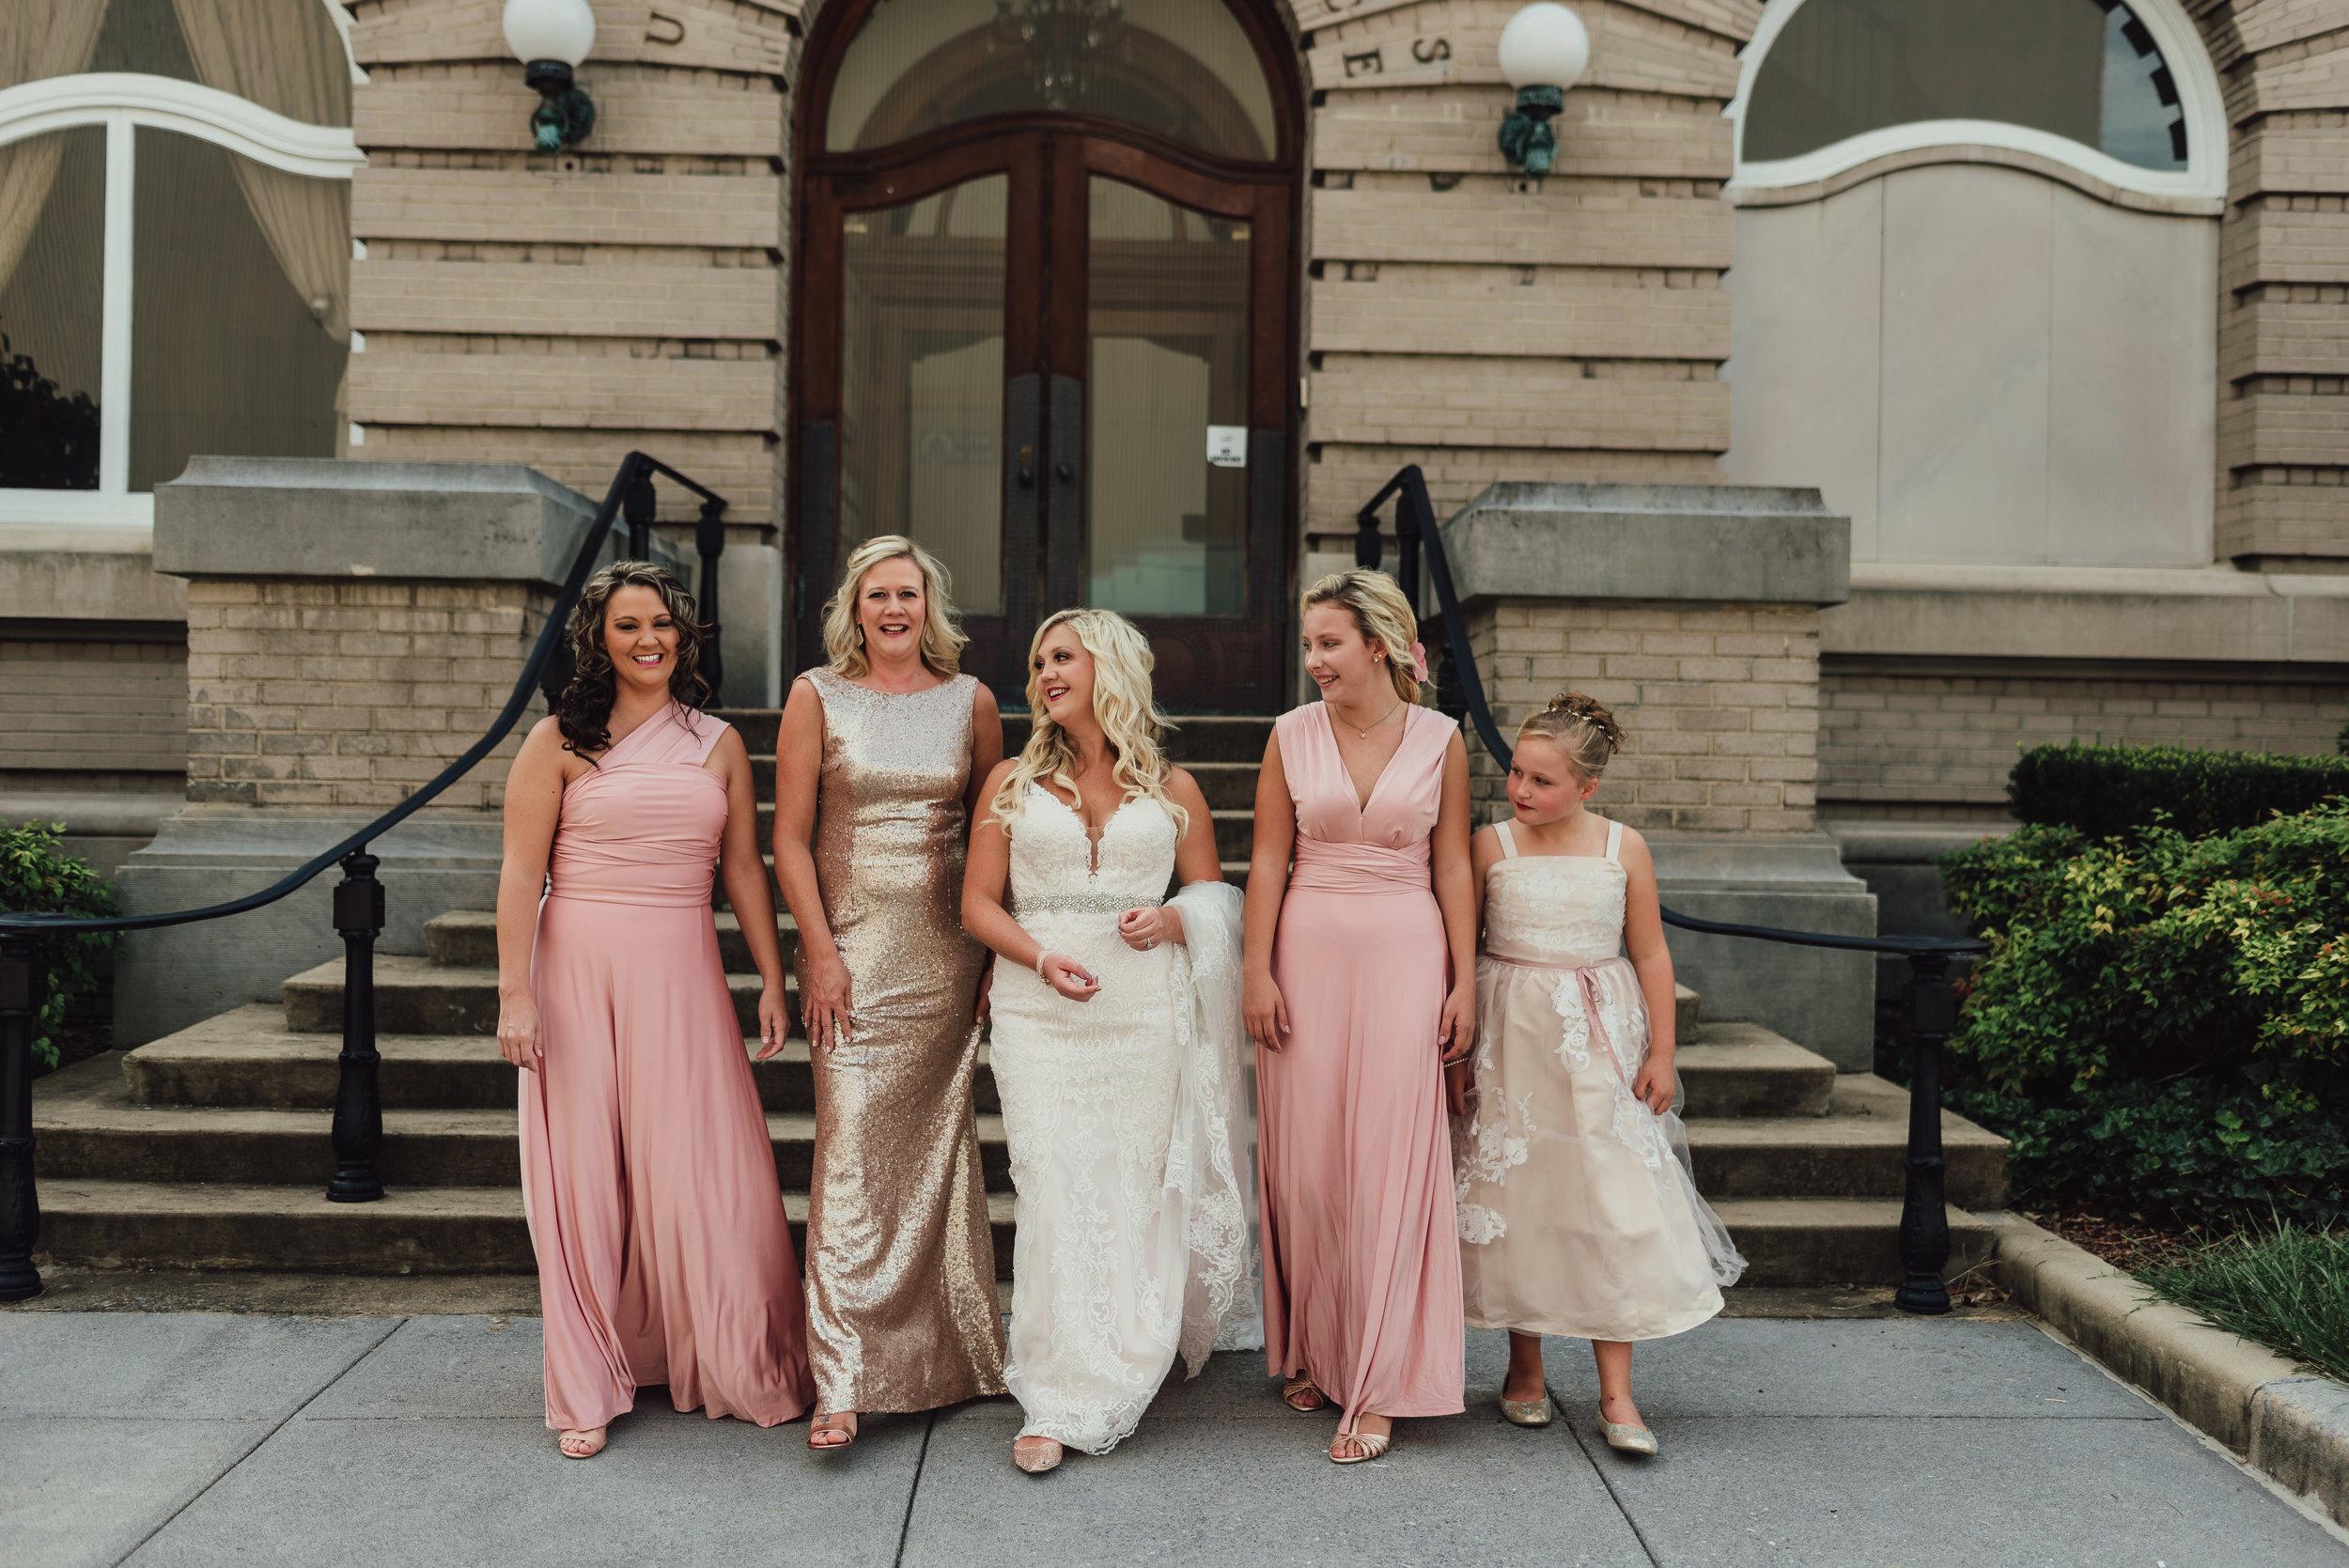 east-tn-wedding-photographer-tennessee-elopement-photographer-kingsport-tn-wedding-photographer (304 of 1001).jpg